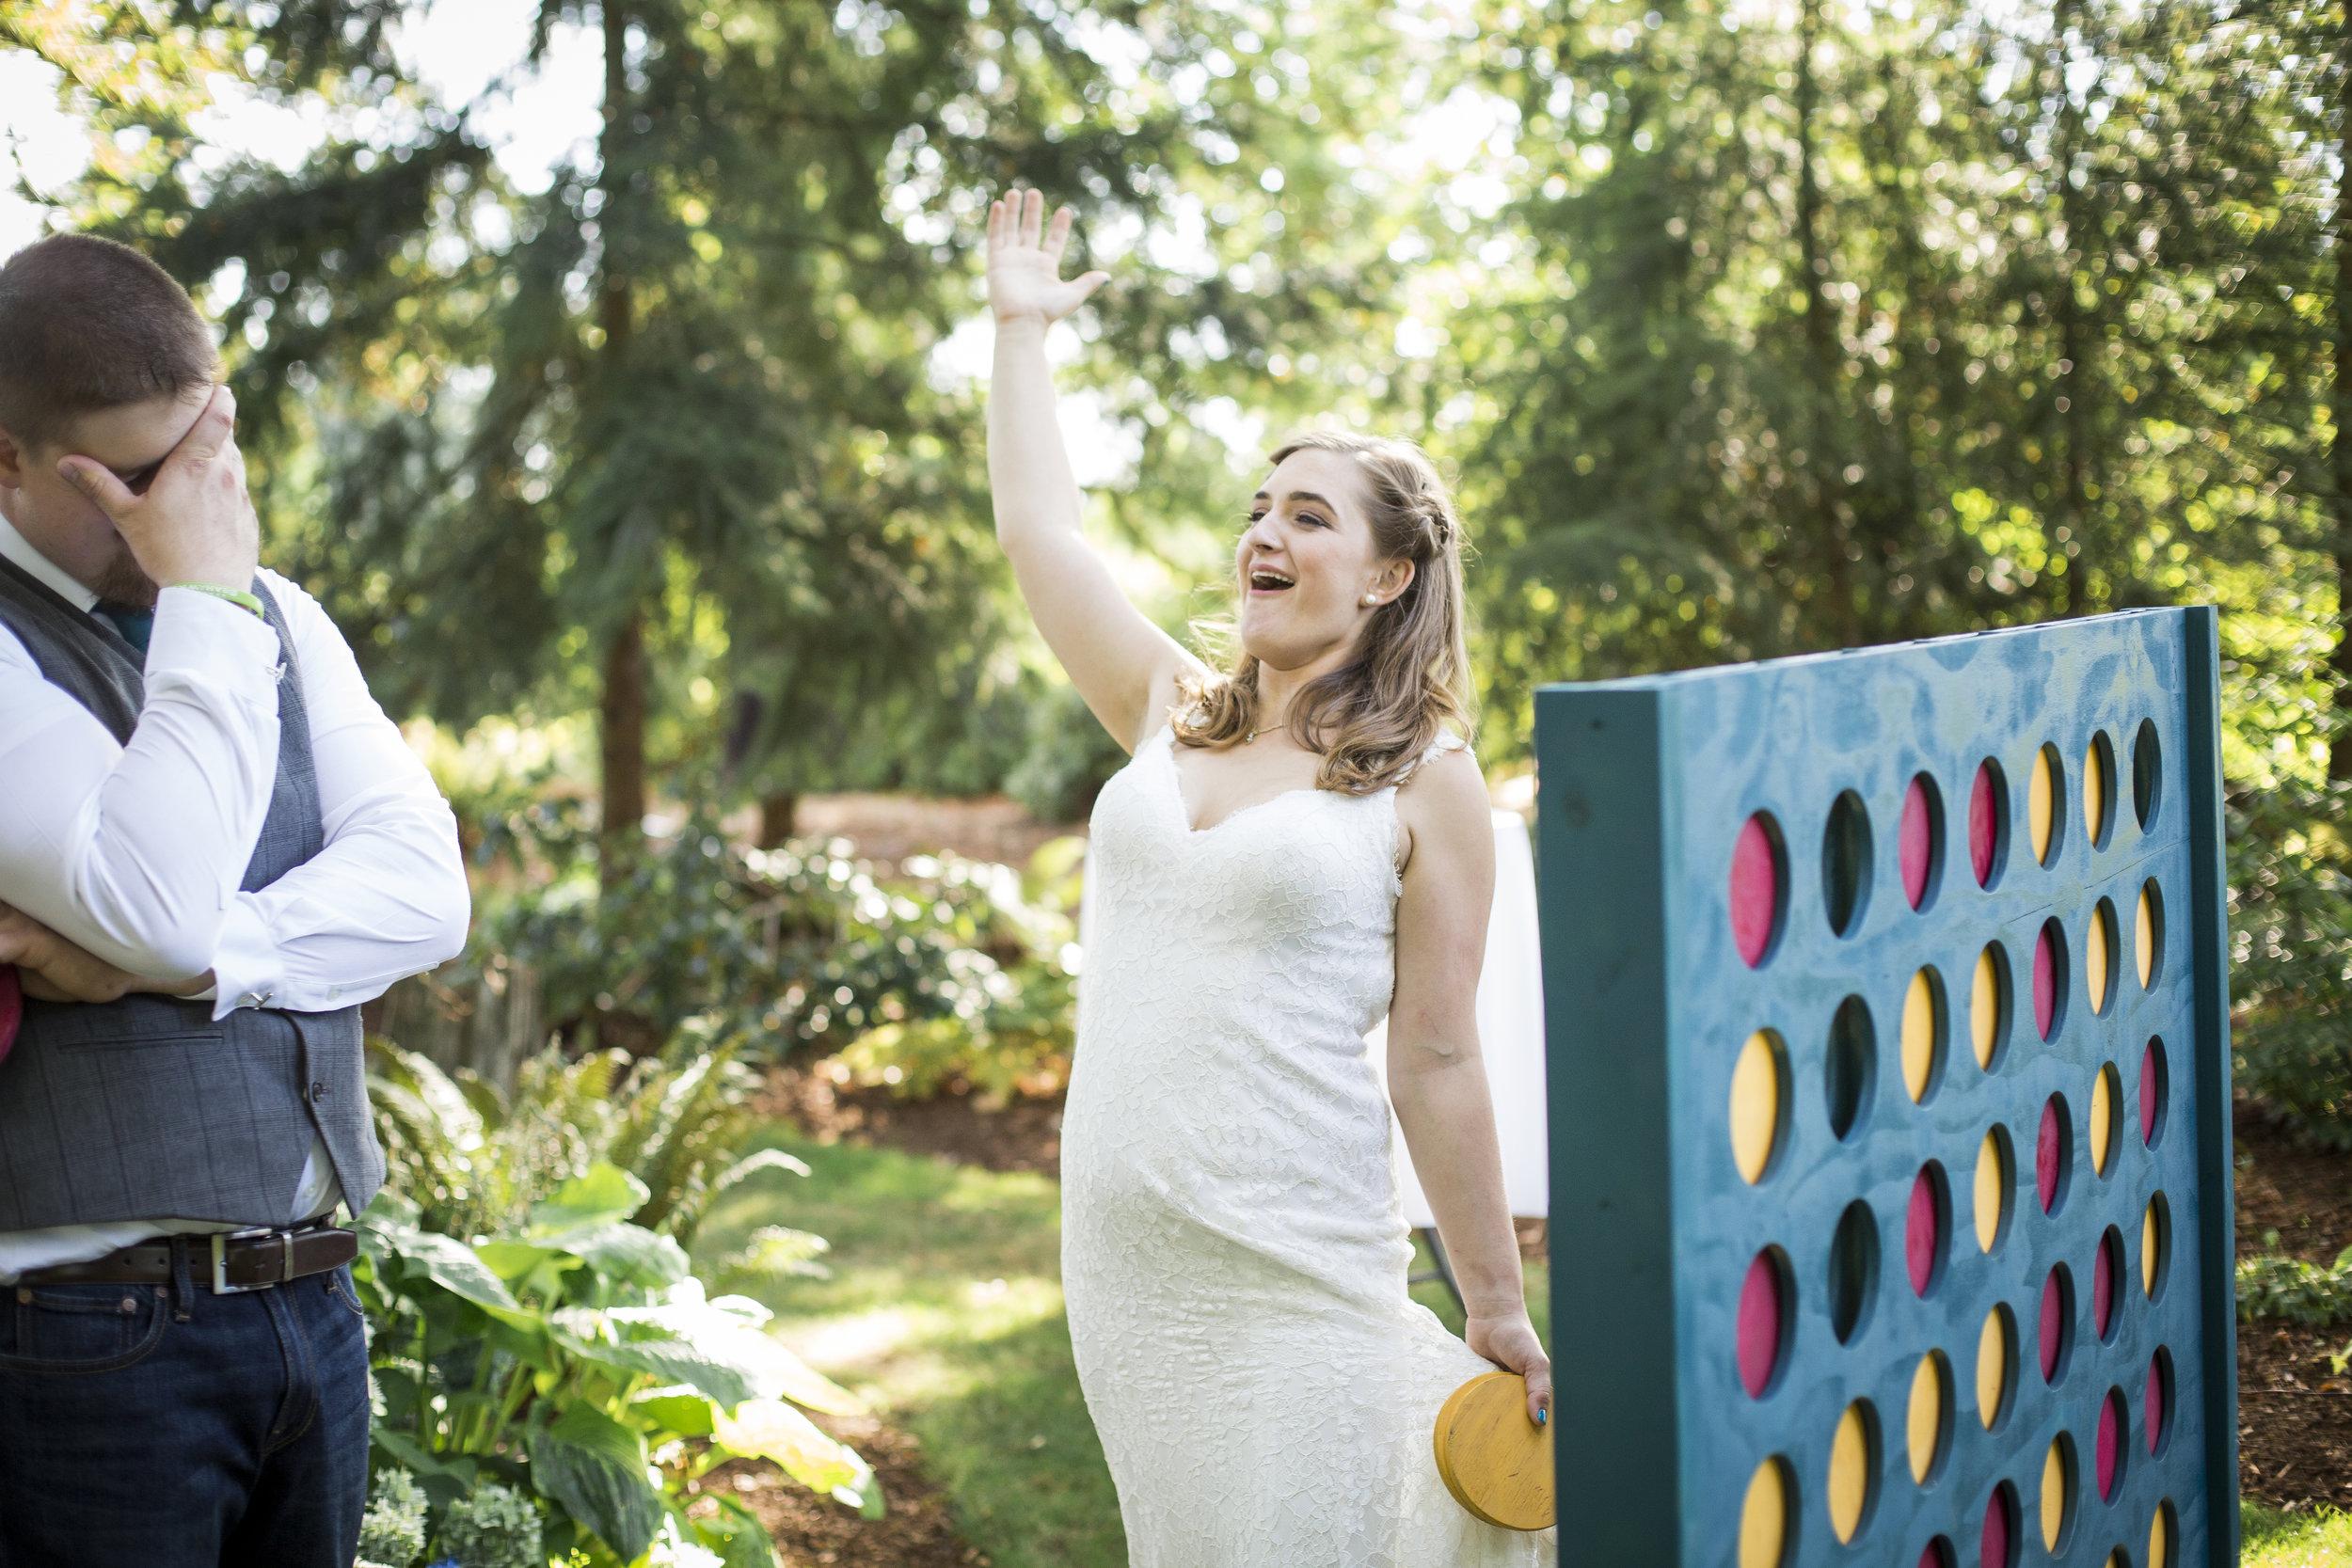 Seattle-Tacoma-Wedding-Photographer-Jaeda-Reed-Fall-Glenwood-Tree-Farm-14.jpg